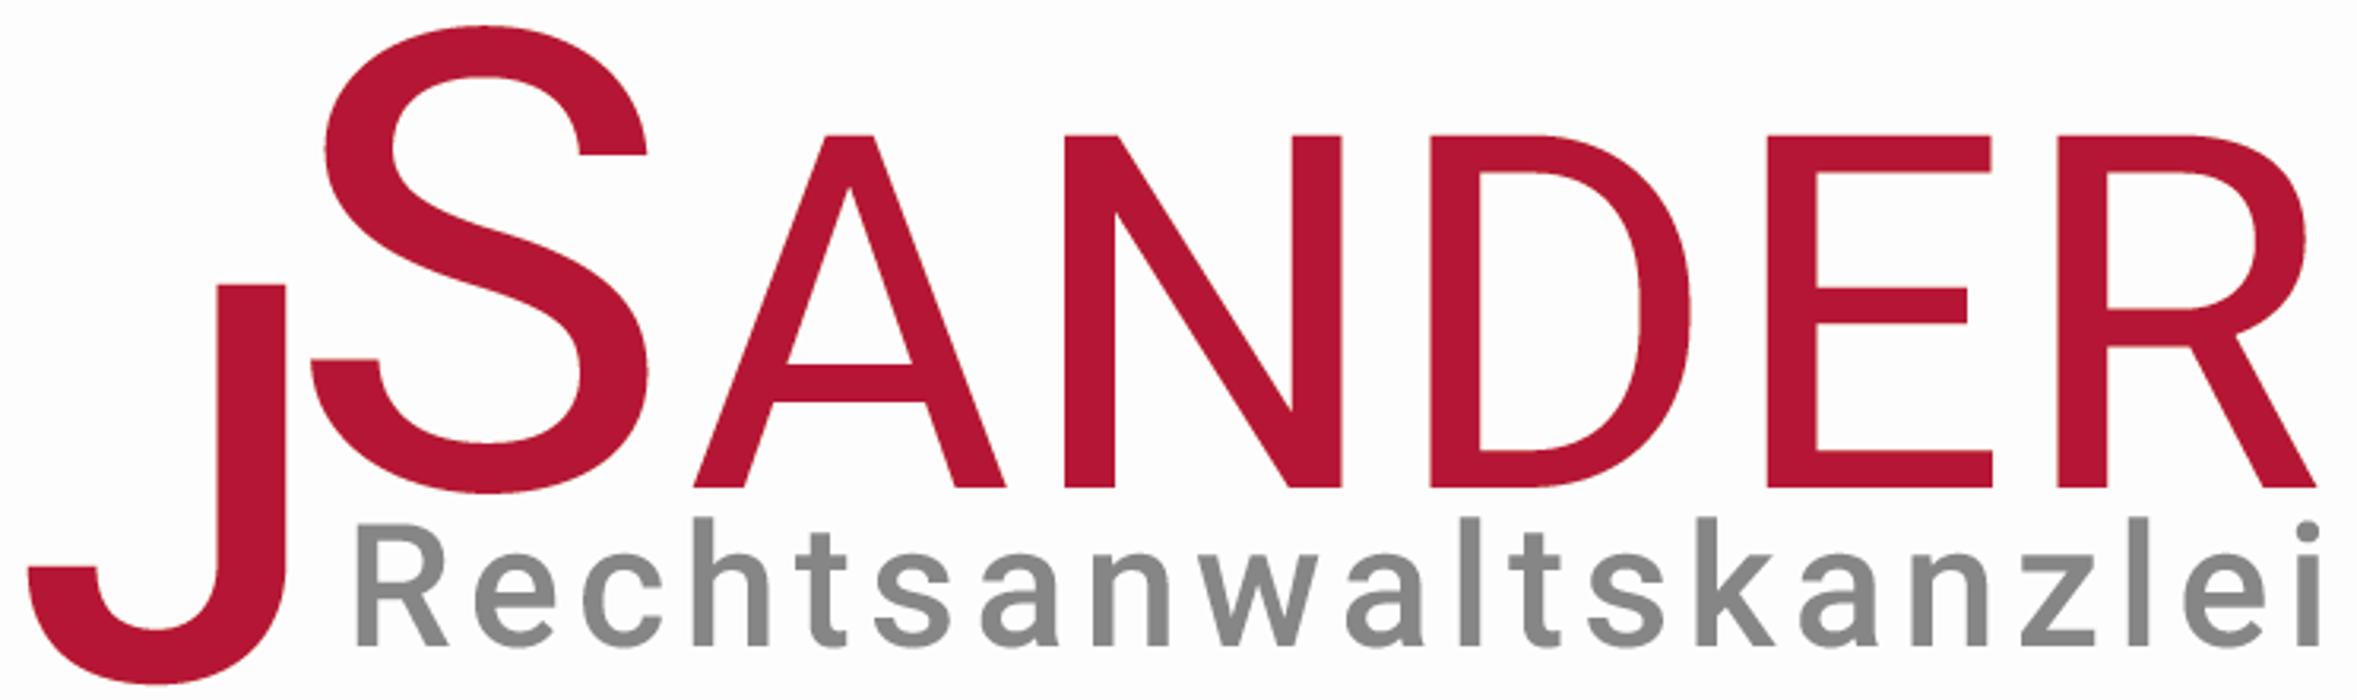 Bild zu Anwaltskanzlei Sander in Heilbronn am Neckar